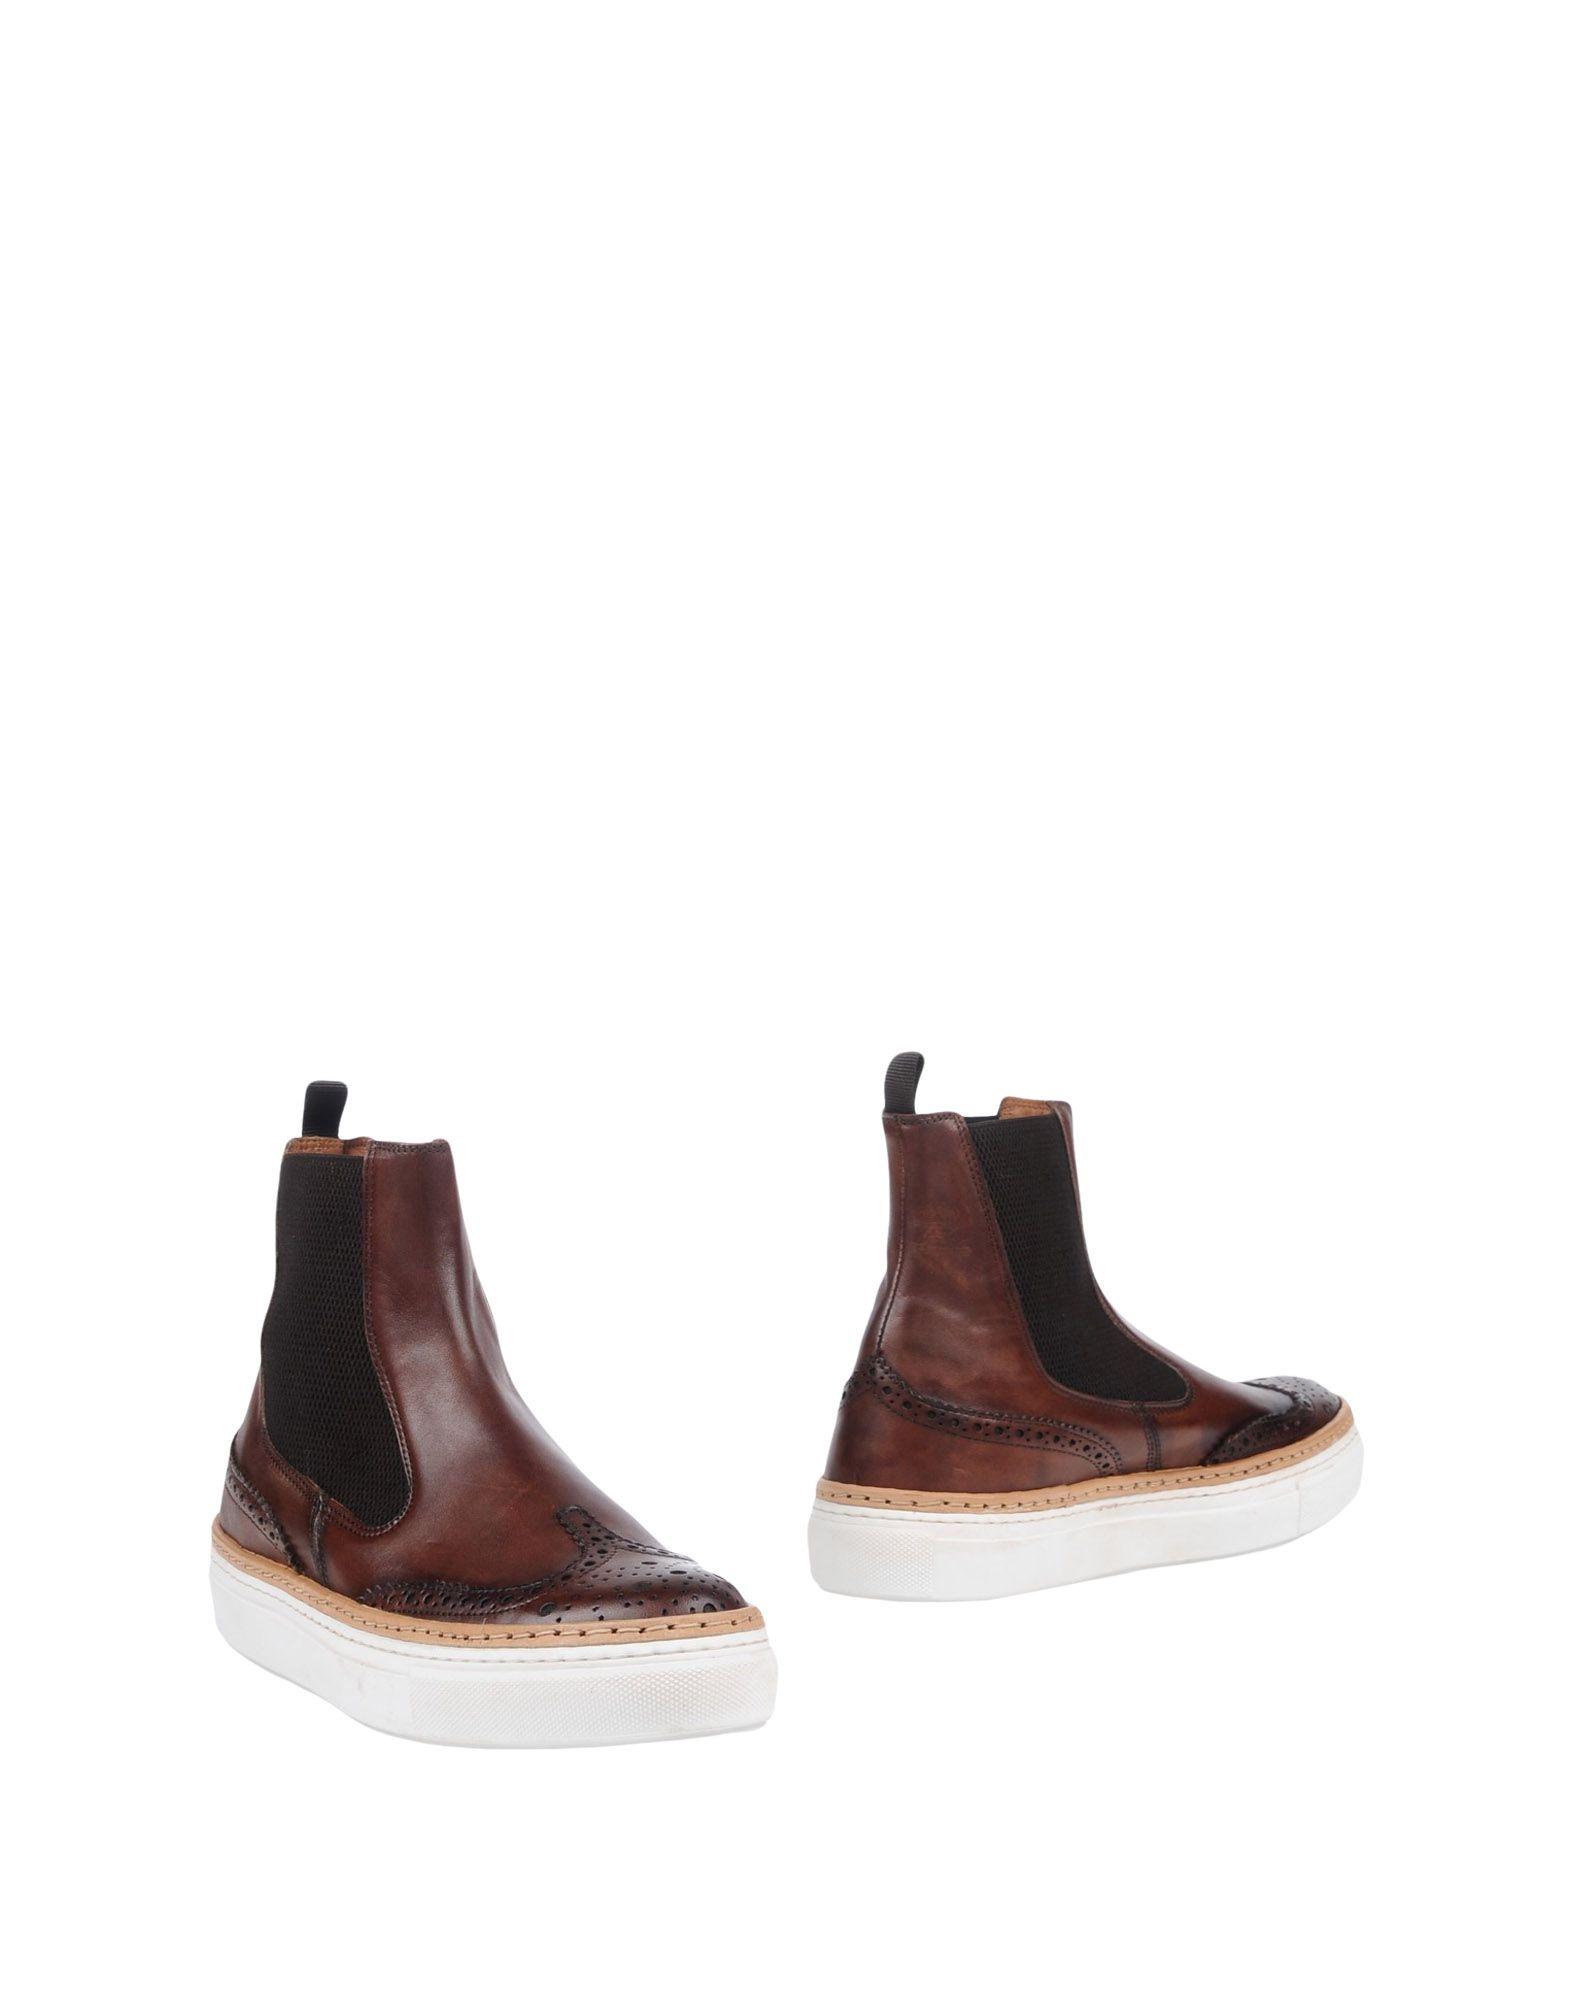 Pantofola D'oro Gute Sneakers Herren  11459868EE Gute D'oro Qualität beliebte Schuhe b67d31